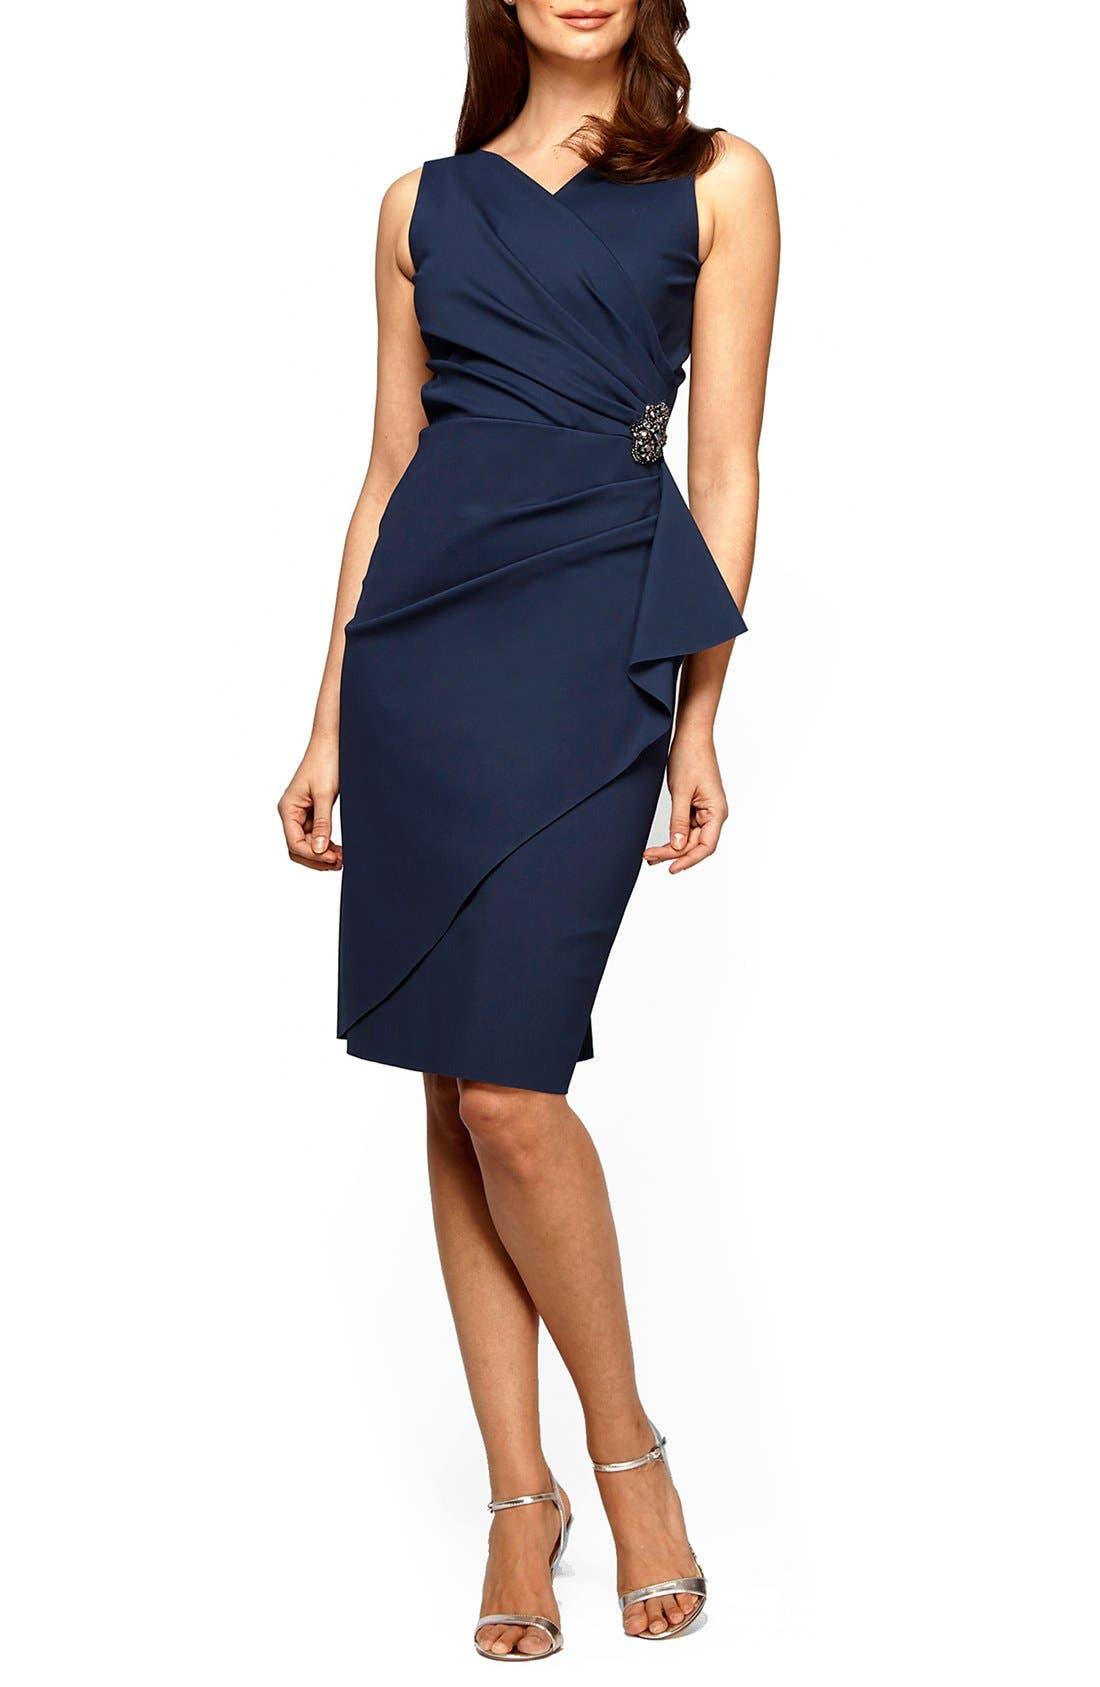 Petite Alex Evenings Side Ruched Dress, Blue